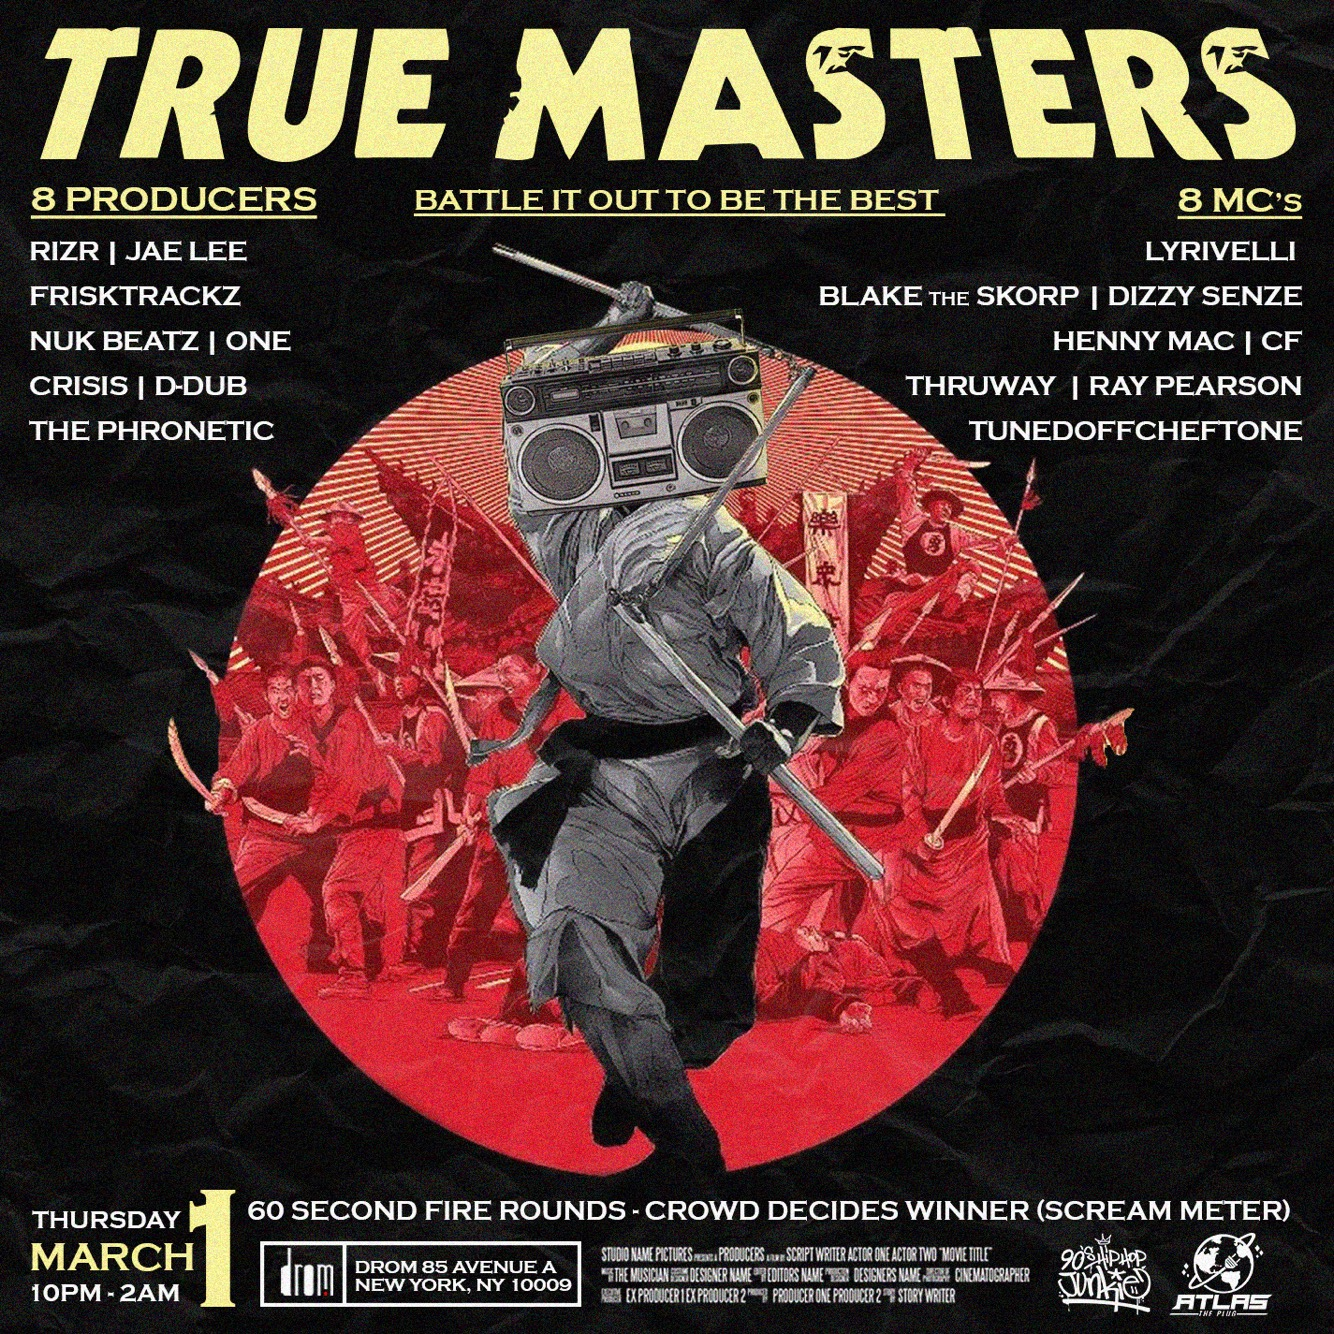 True Masters